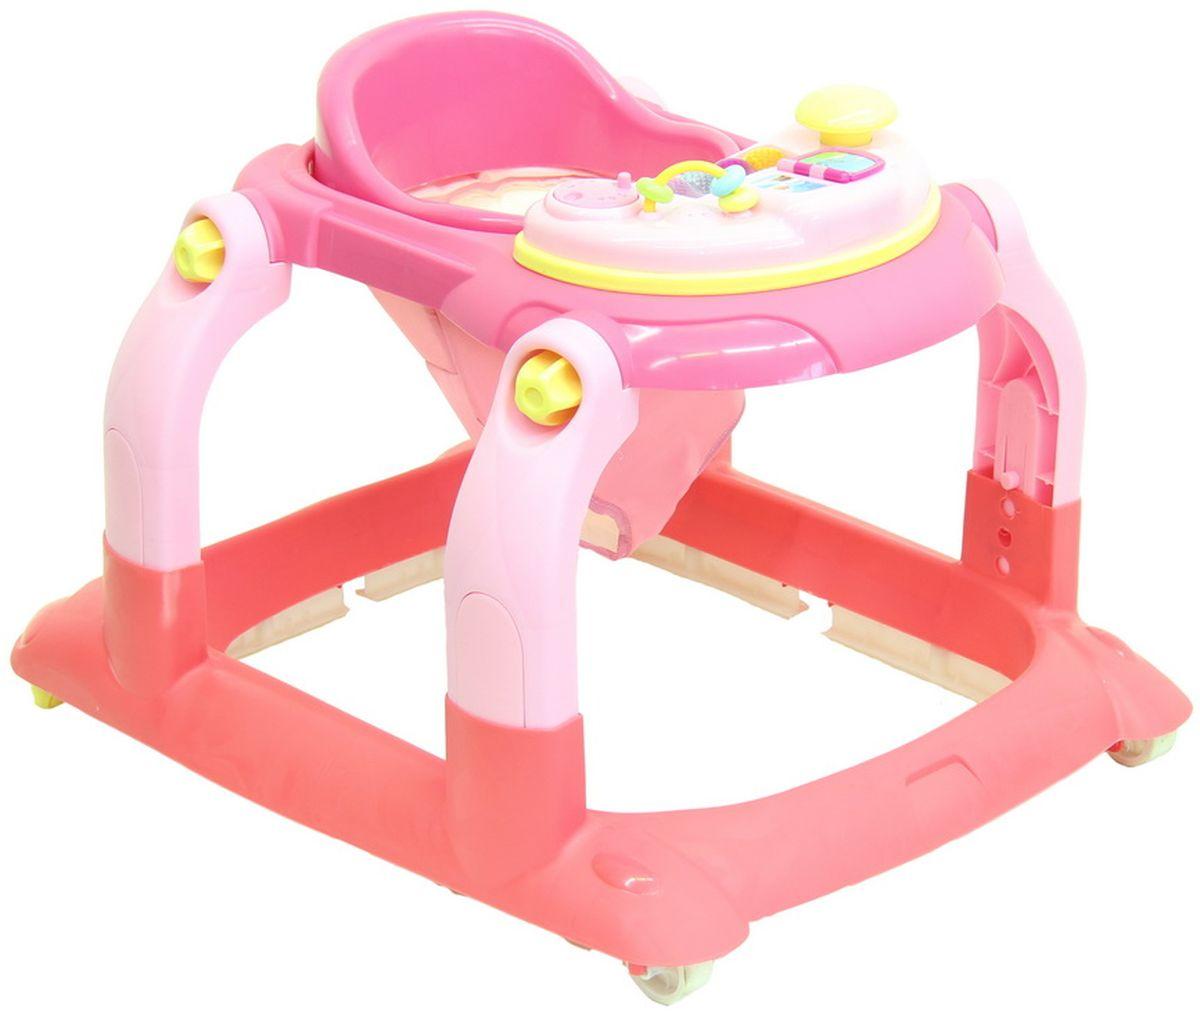 Selby Ходунки цвет розовый 827409 -  Ходунки, прыгунки, качалки